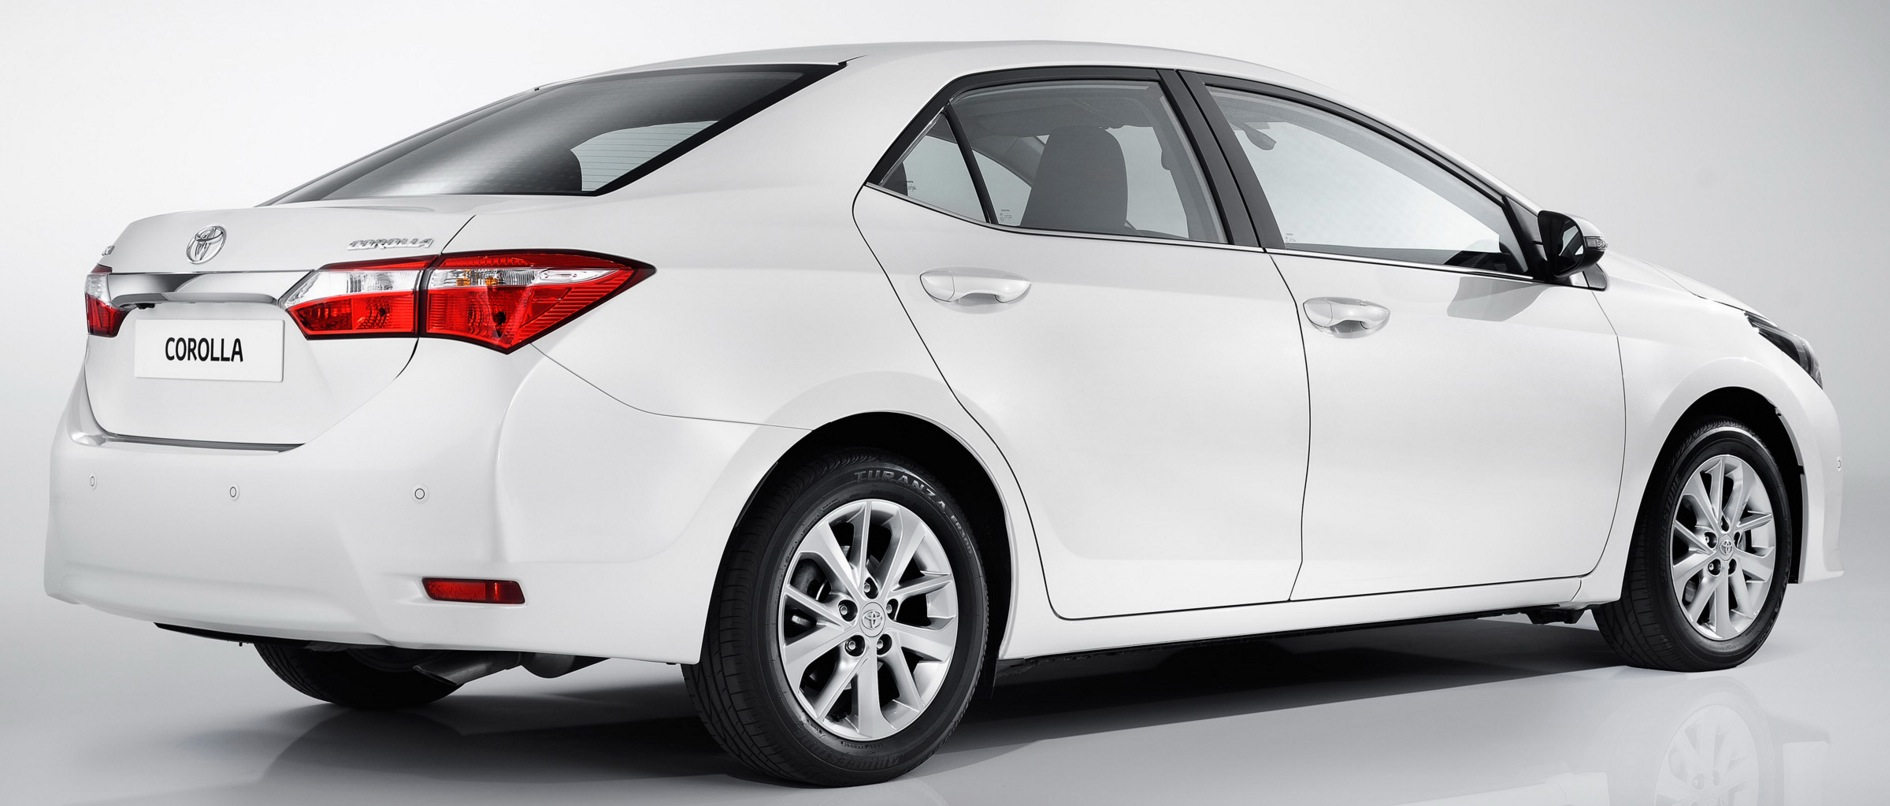 GALLERY: 2014 Toyota Corolla face-off: ASEAN vs US Paul ...